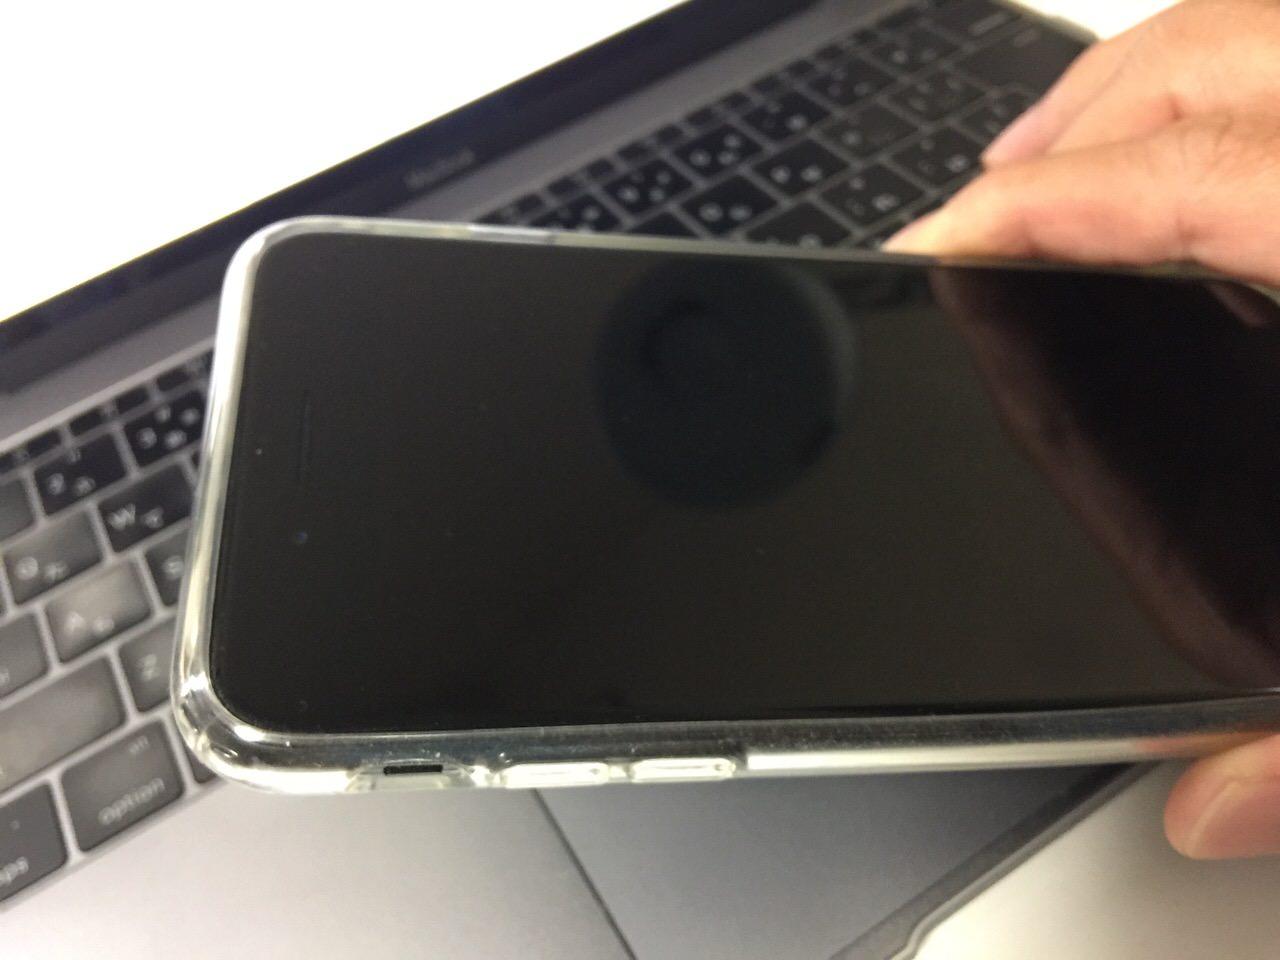 【iOS 10】持ち上げてスリープ解除する「手前に傾けてスリープ解除」をオフにする方法